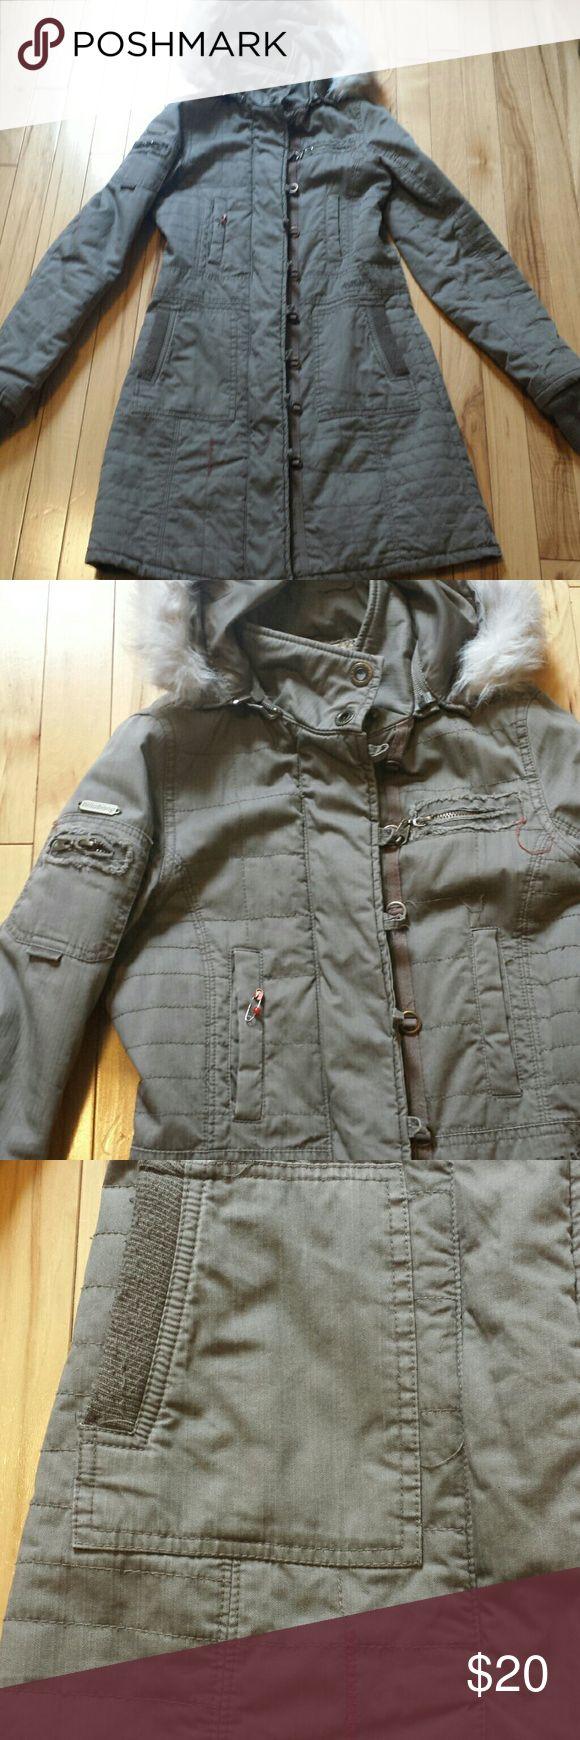 Billabong parka with faux fur trim hood Billabong parka with faux fur trim hood Jackets & Coats